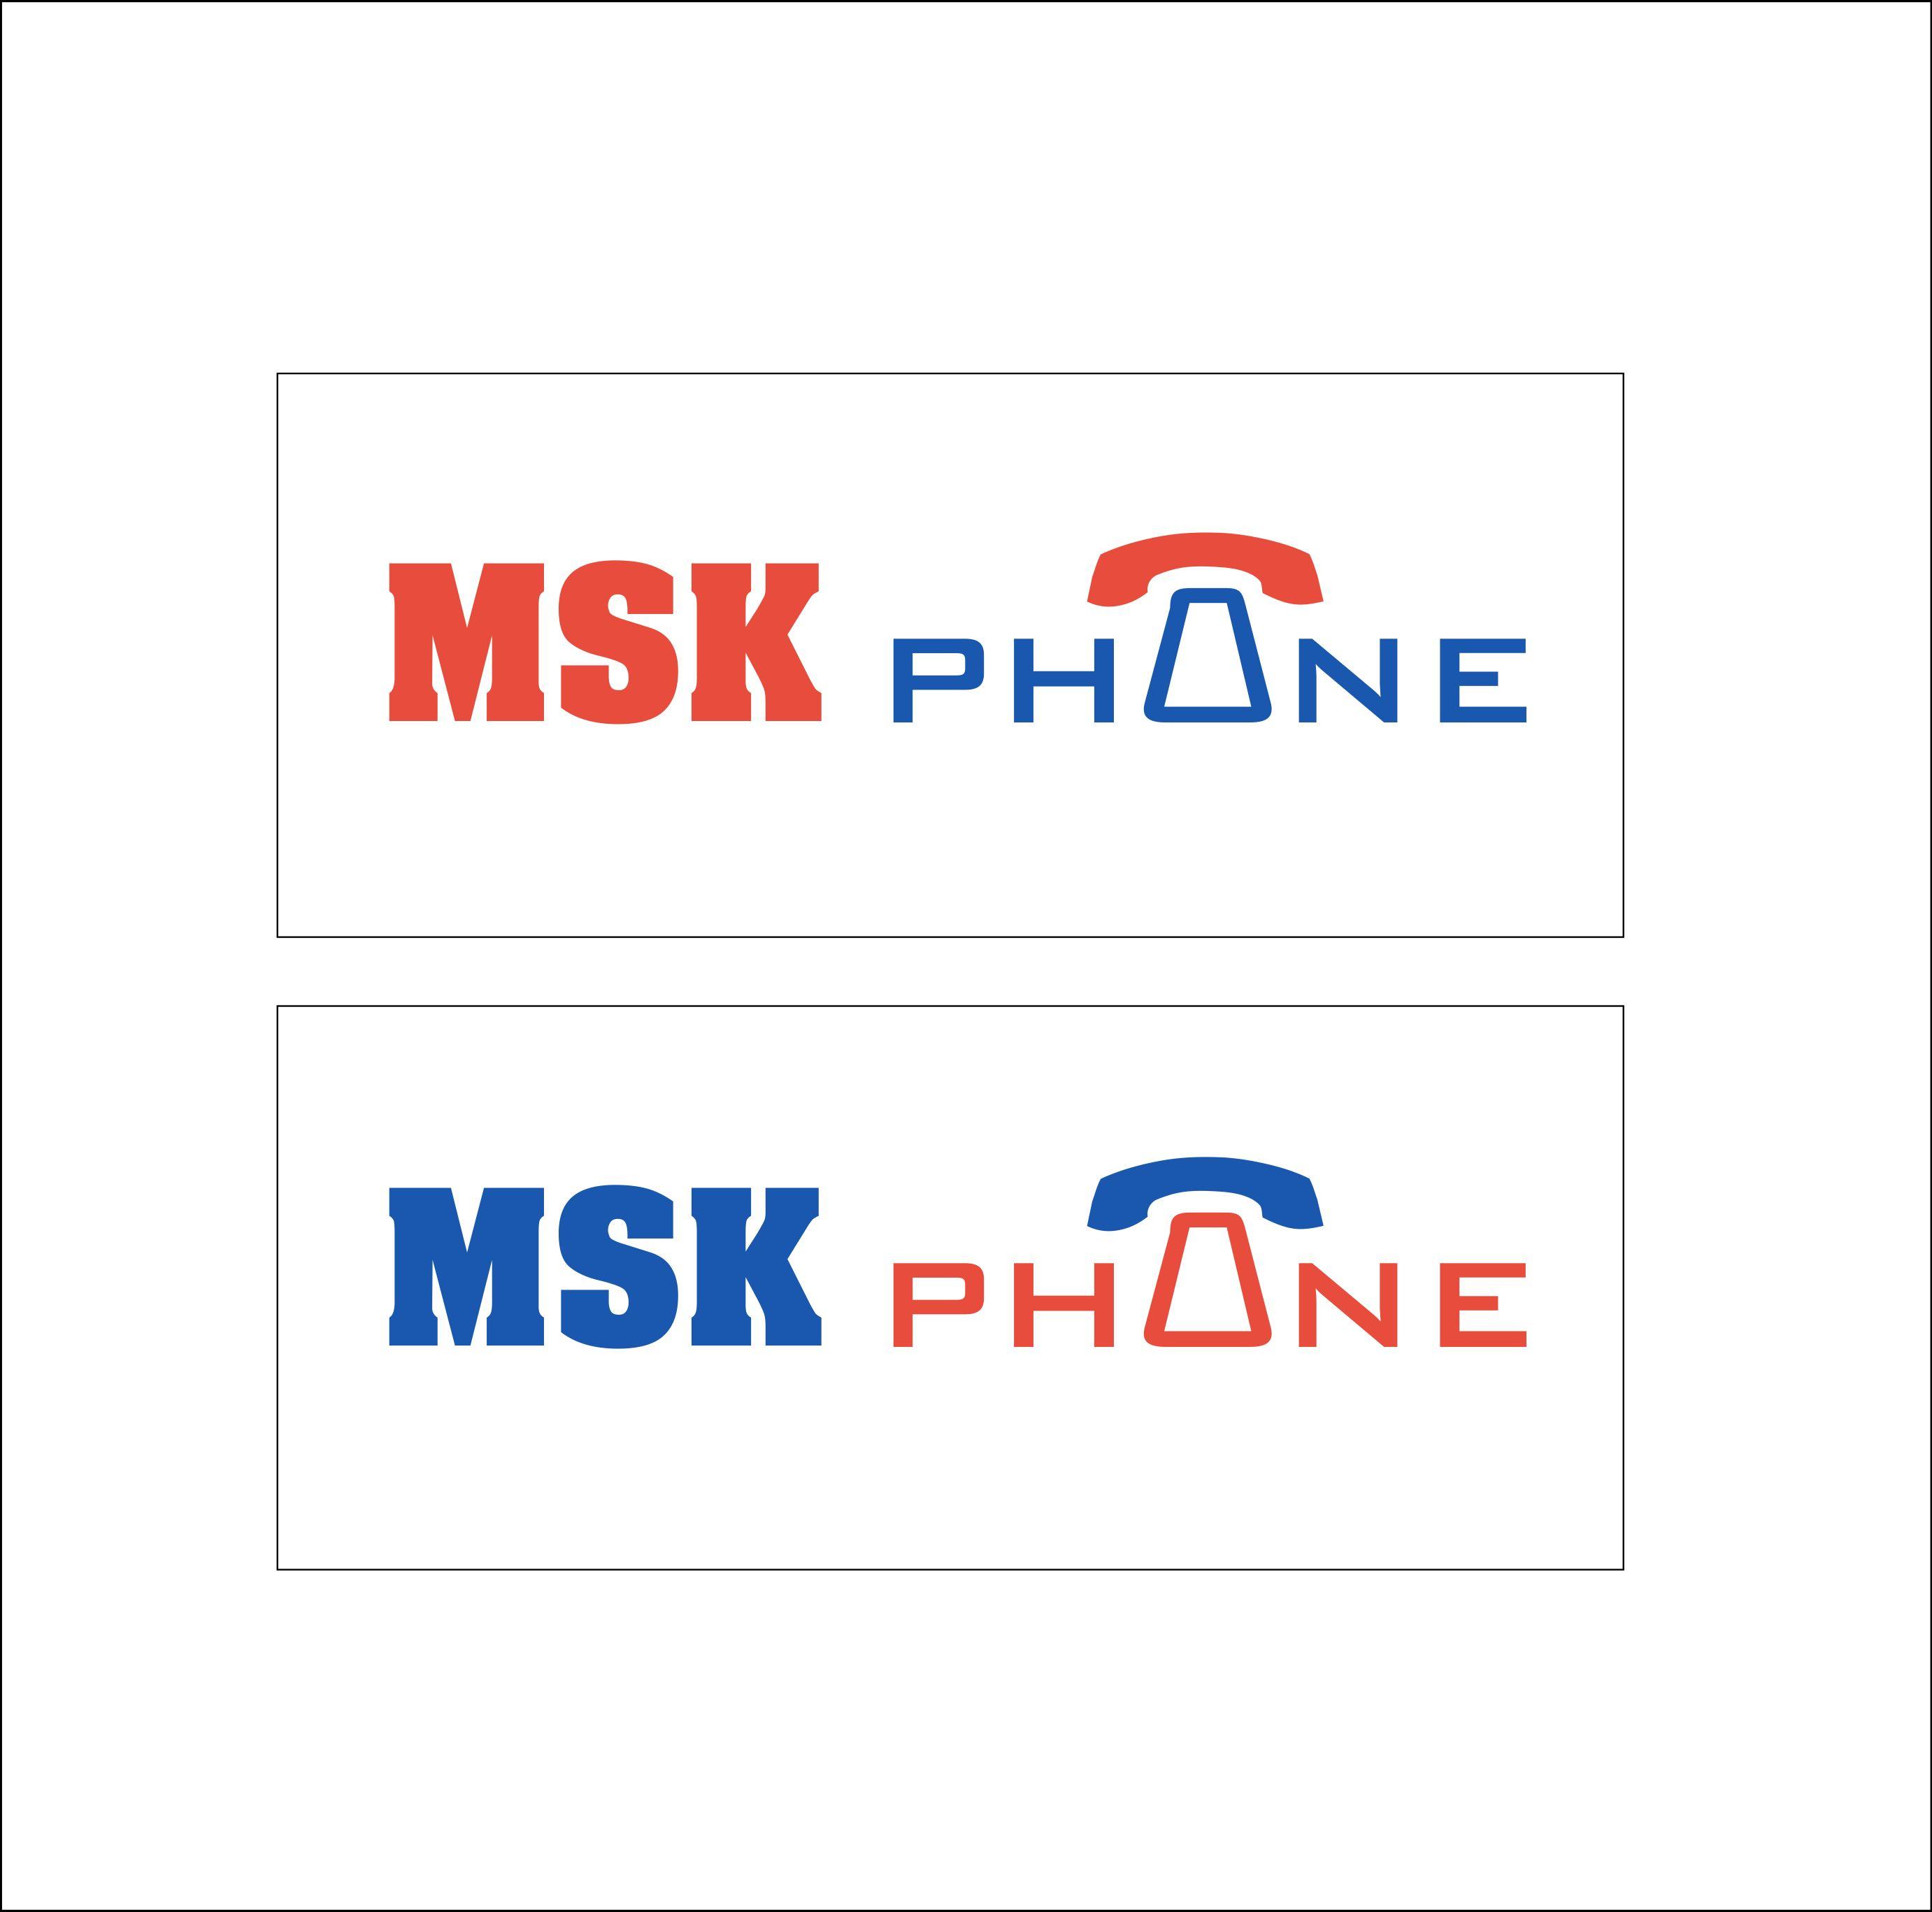 Логотип для MSKPHONE - дизайнер 1511993